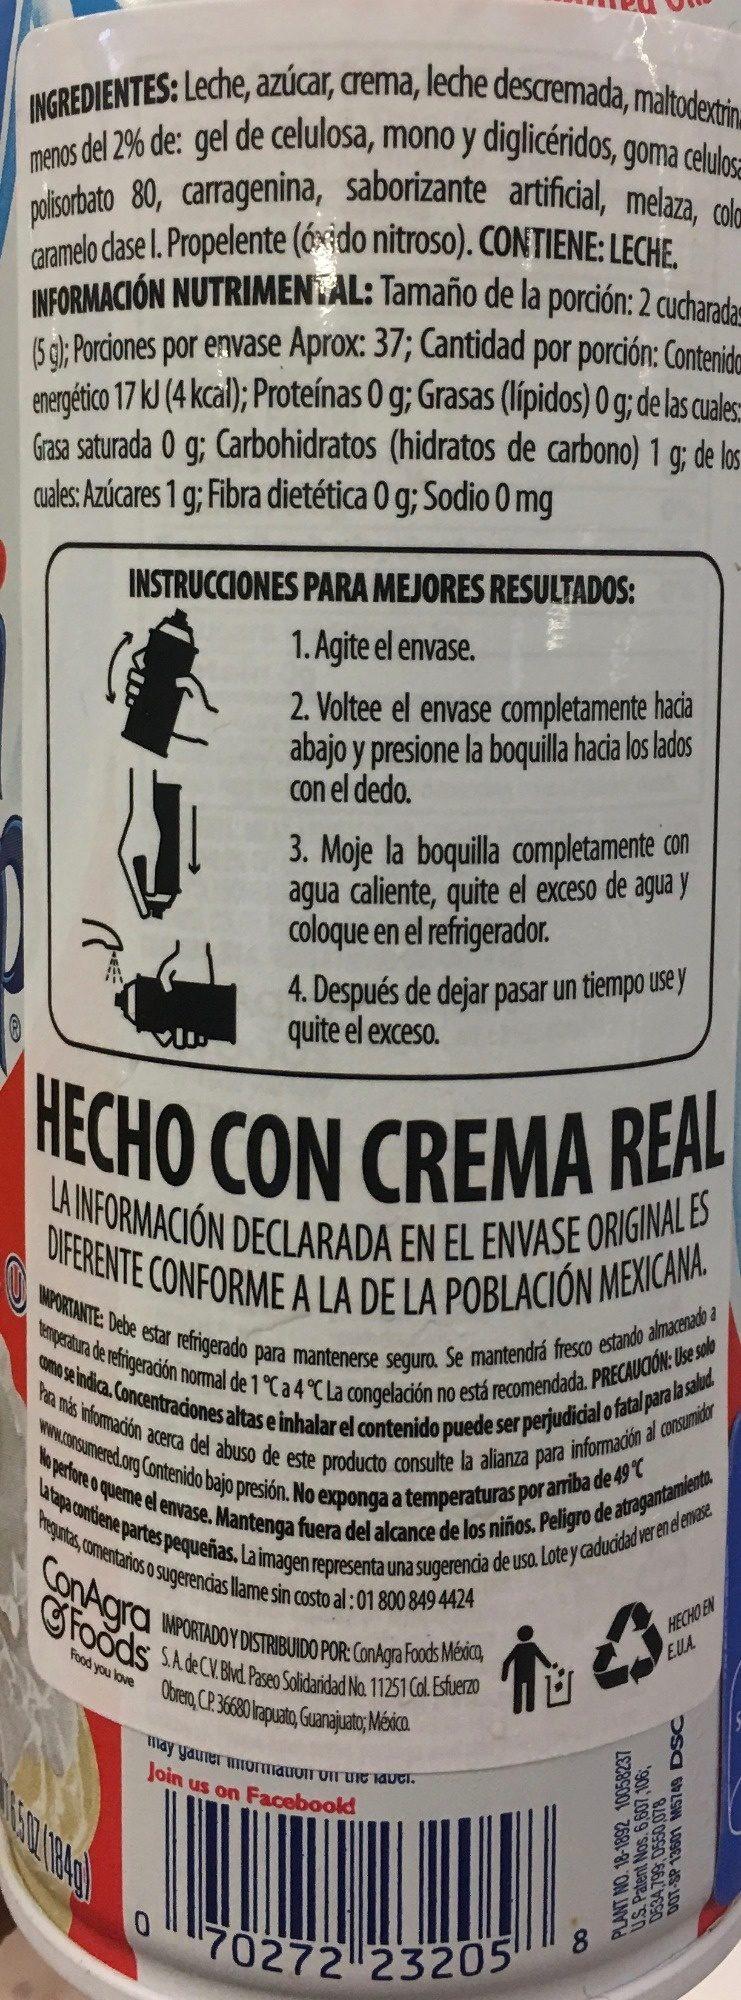 Reddi-wip Fat Free Whipped Dairy Cream Topping, 6.5 oz., 6.5 OZ - Información nutricional - es